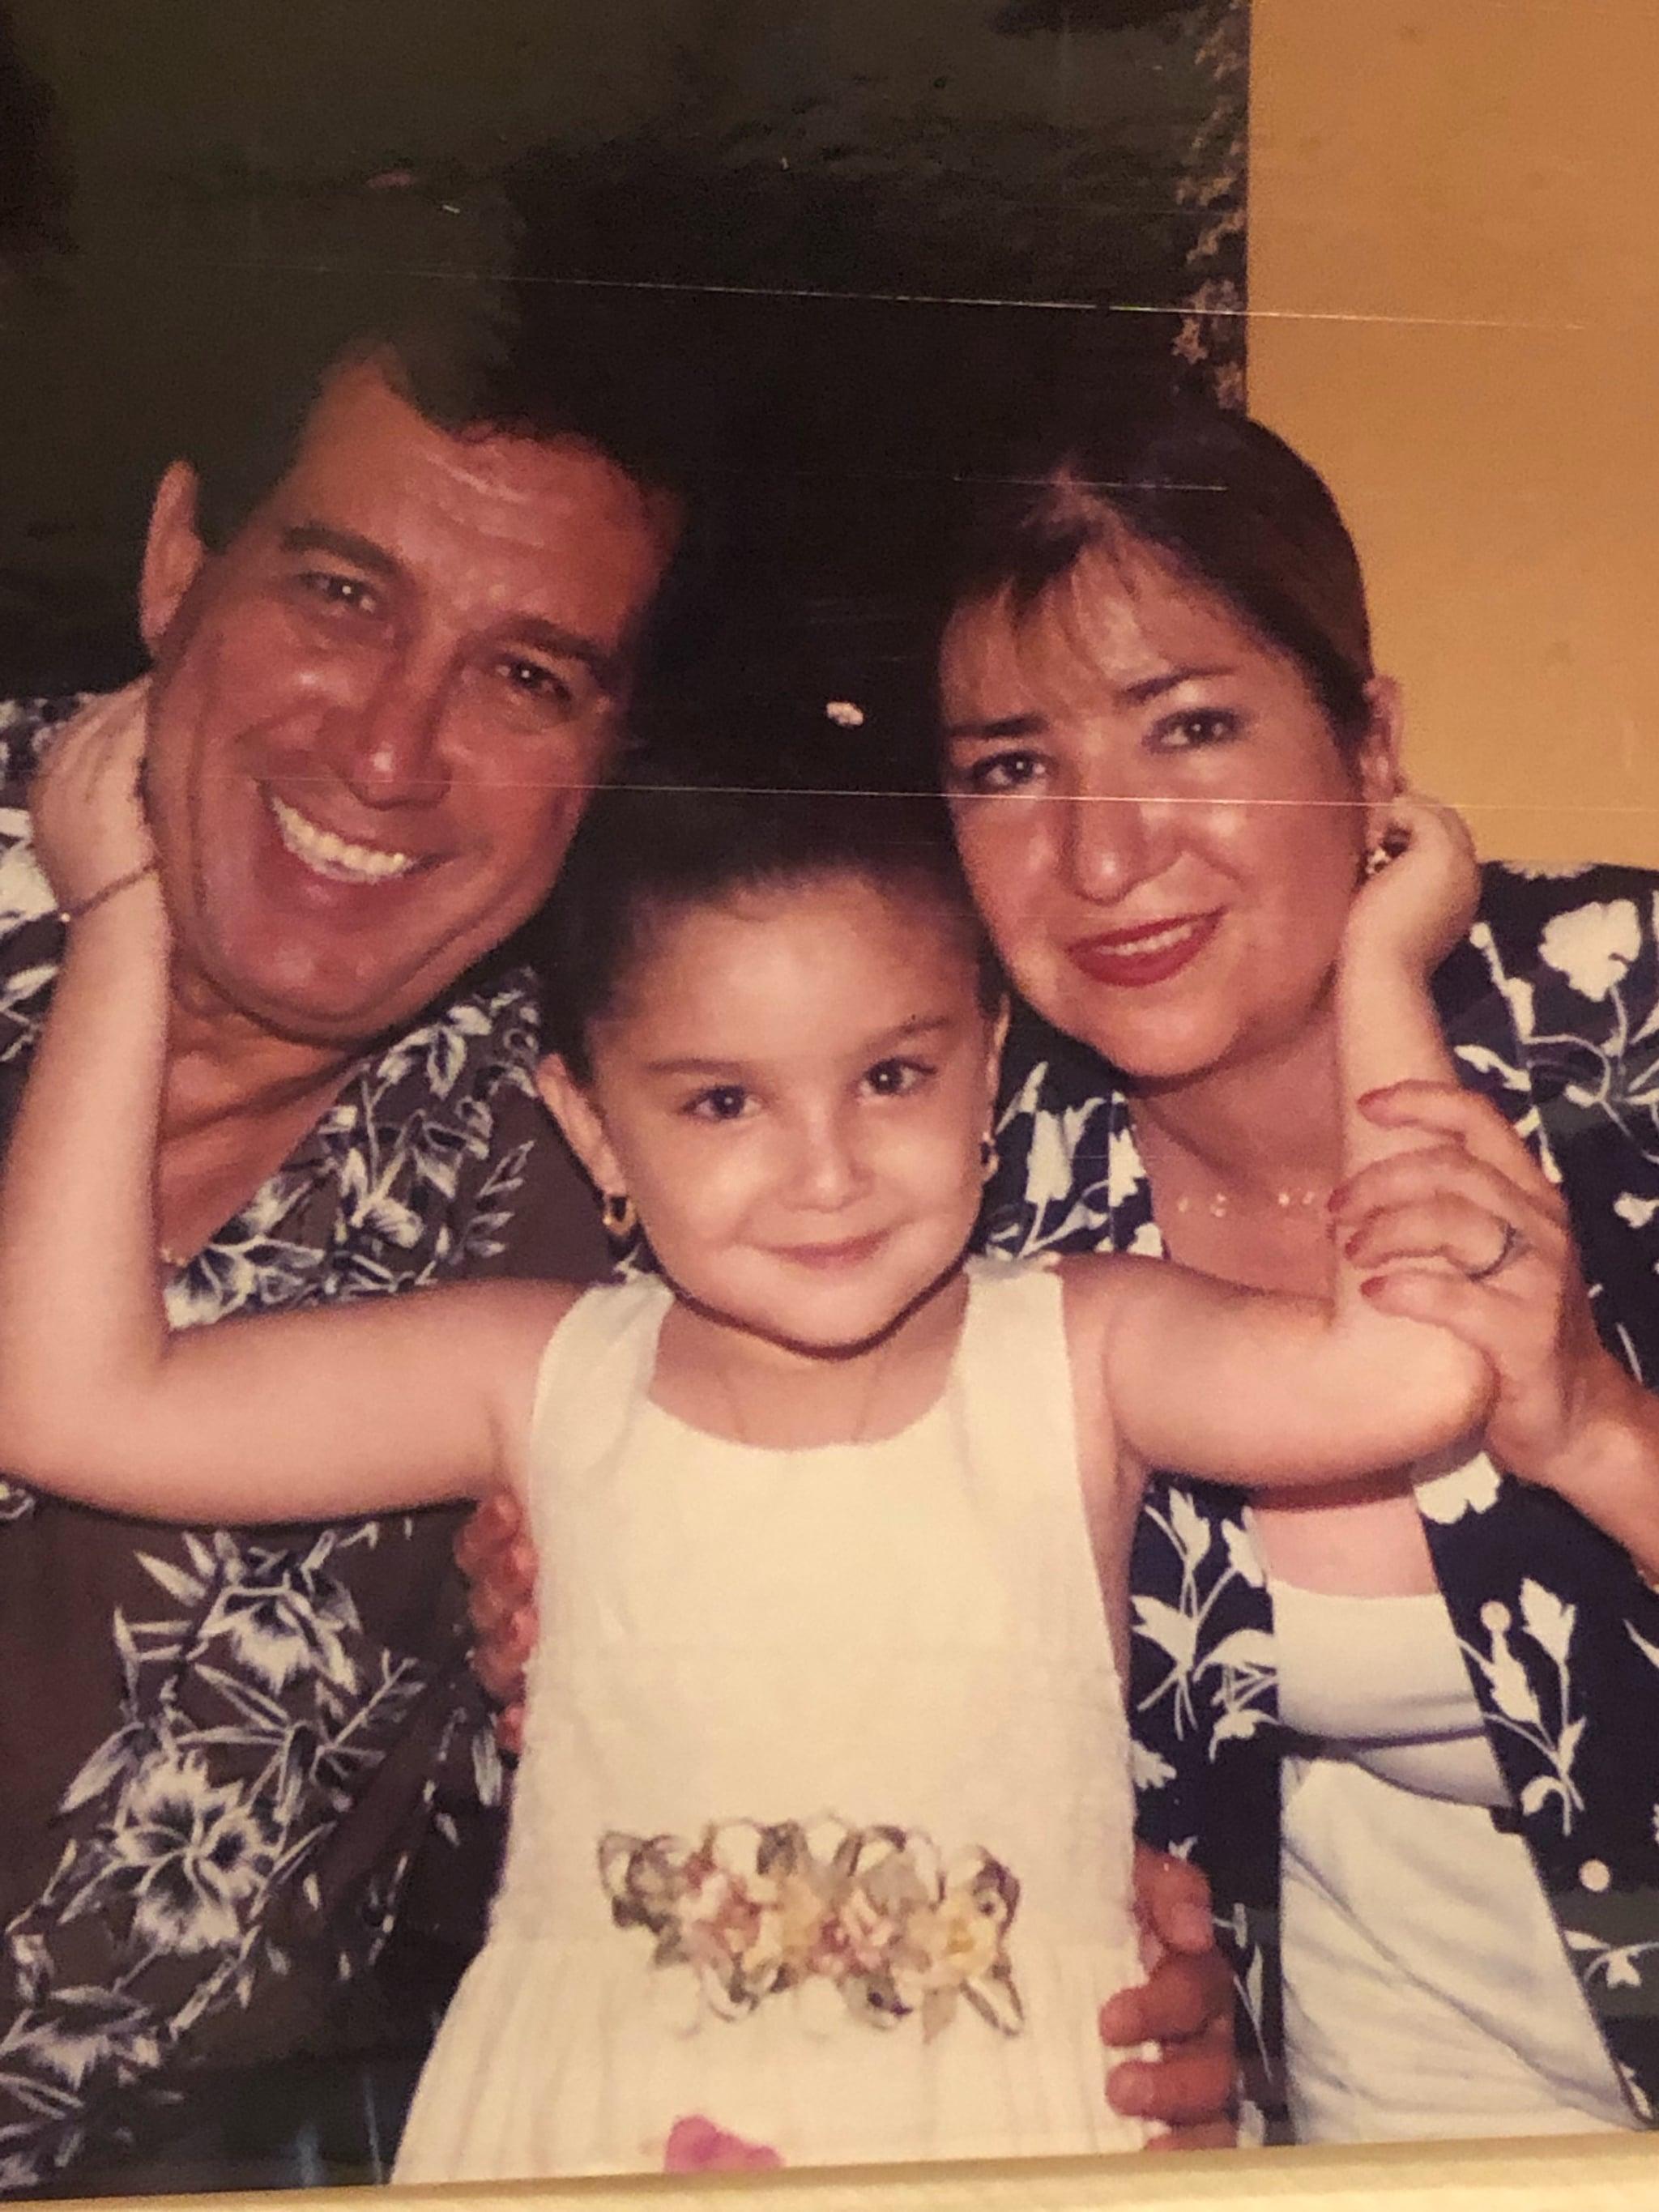 tmp_qEmooV_9d9e2ebfafb5b4b9_Picture_of_Elsa_With_Parents.jpg